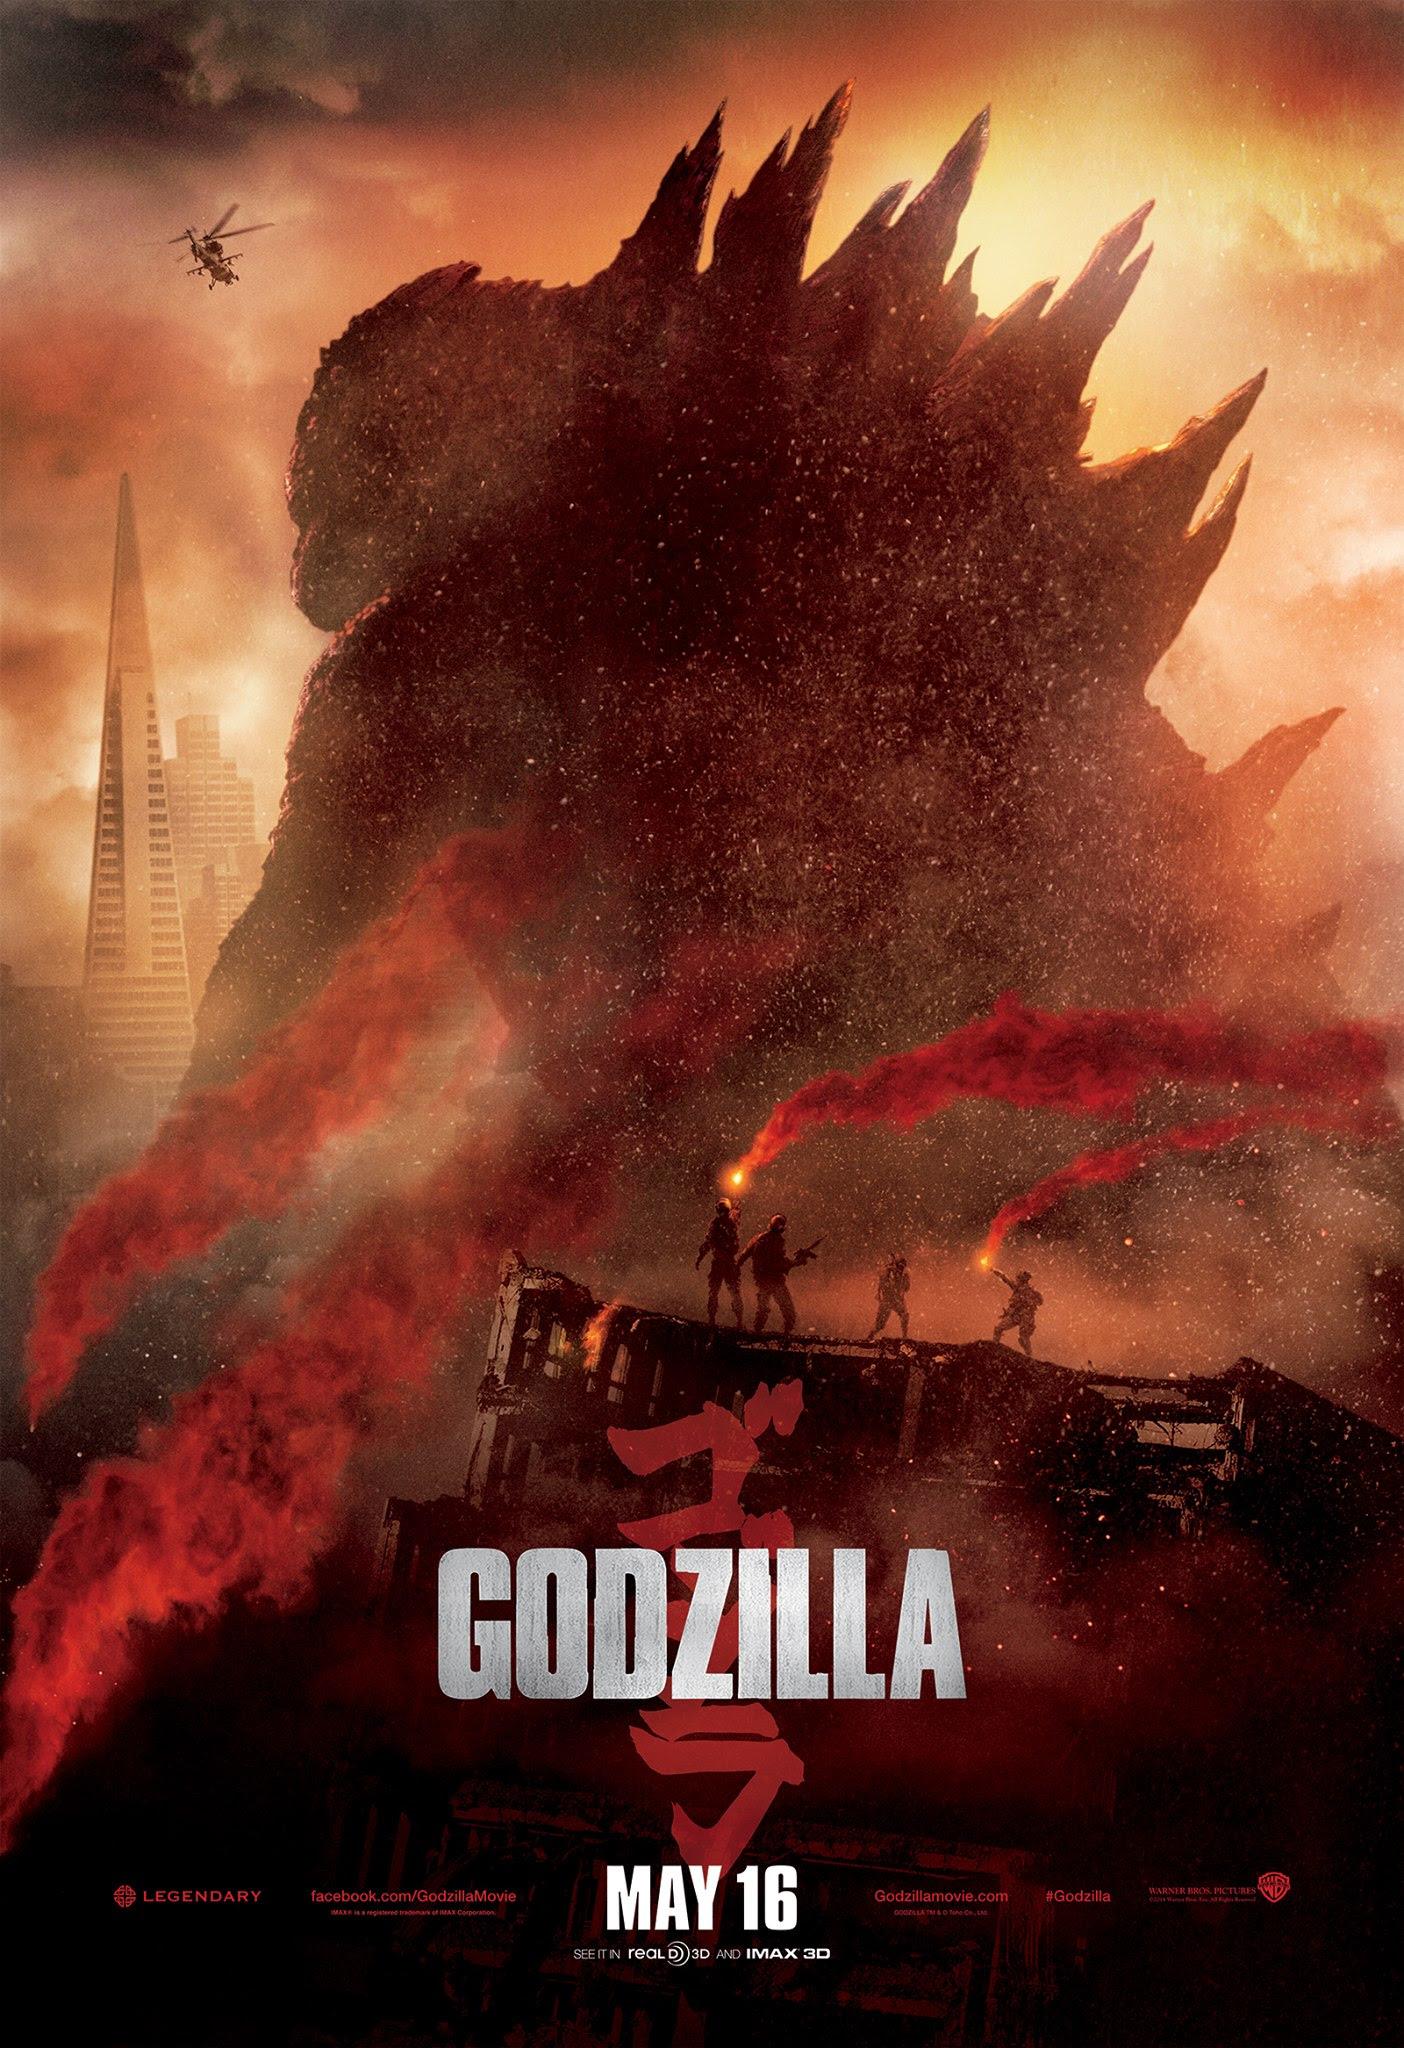 Resultado de imagem para Godzilla 2014 poster